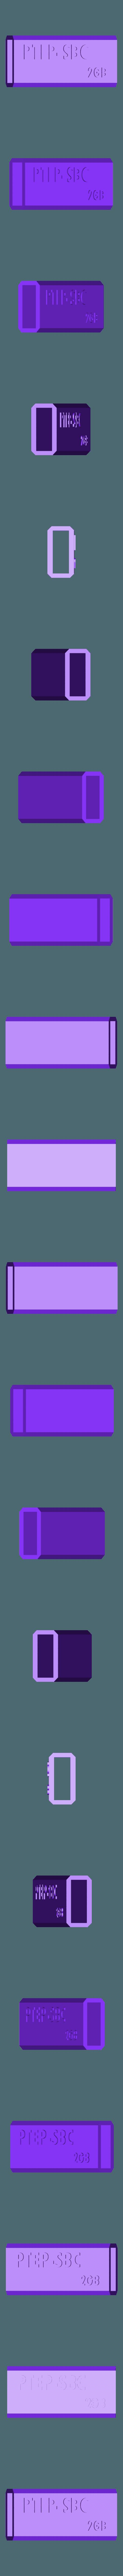 Caja.stl Download free STL file Otg flash drive case • 3D print template, Loren